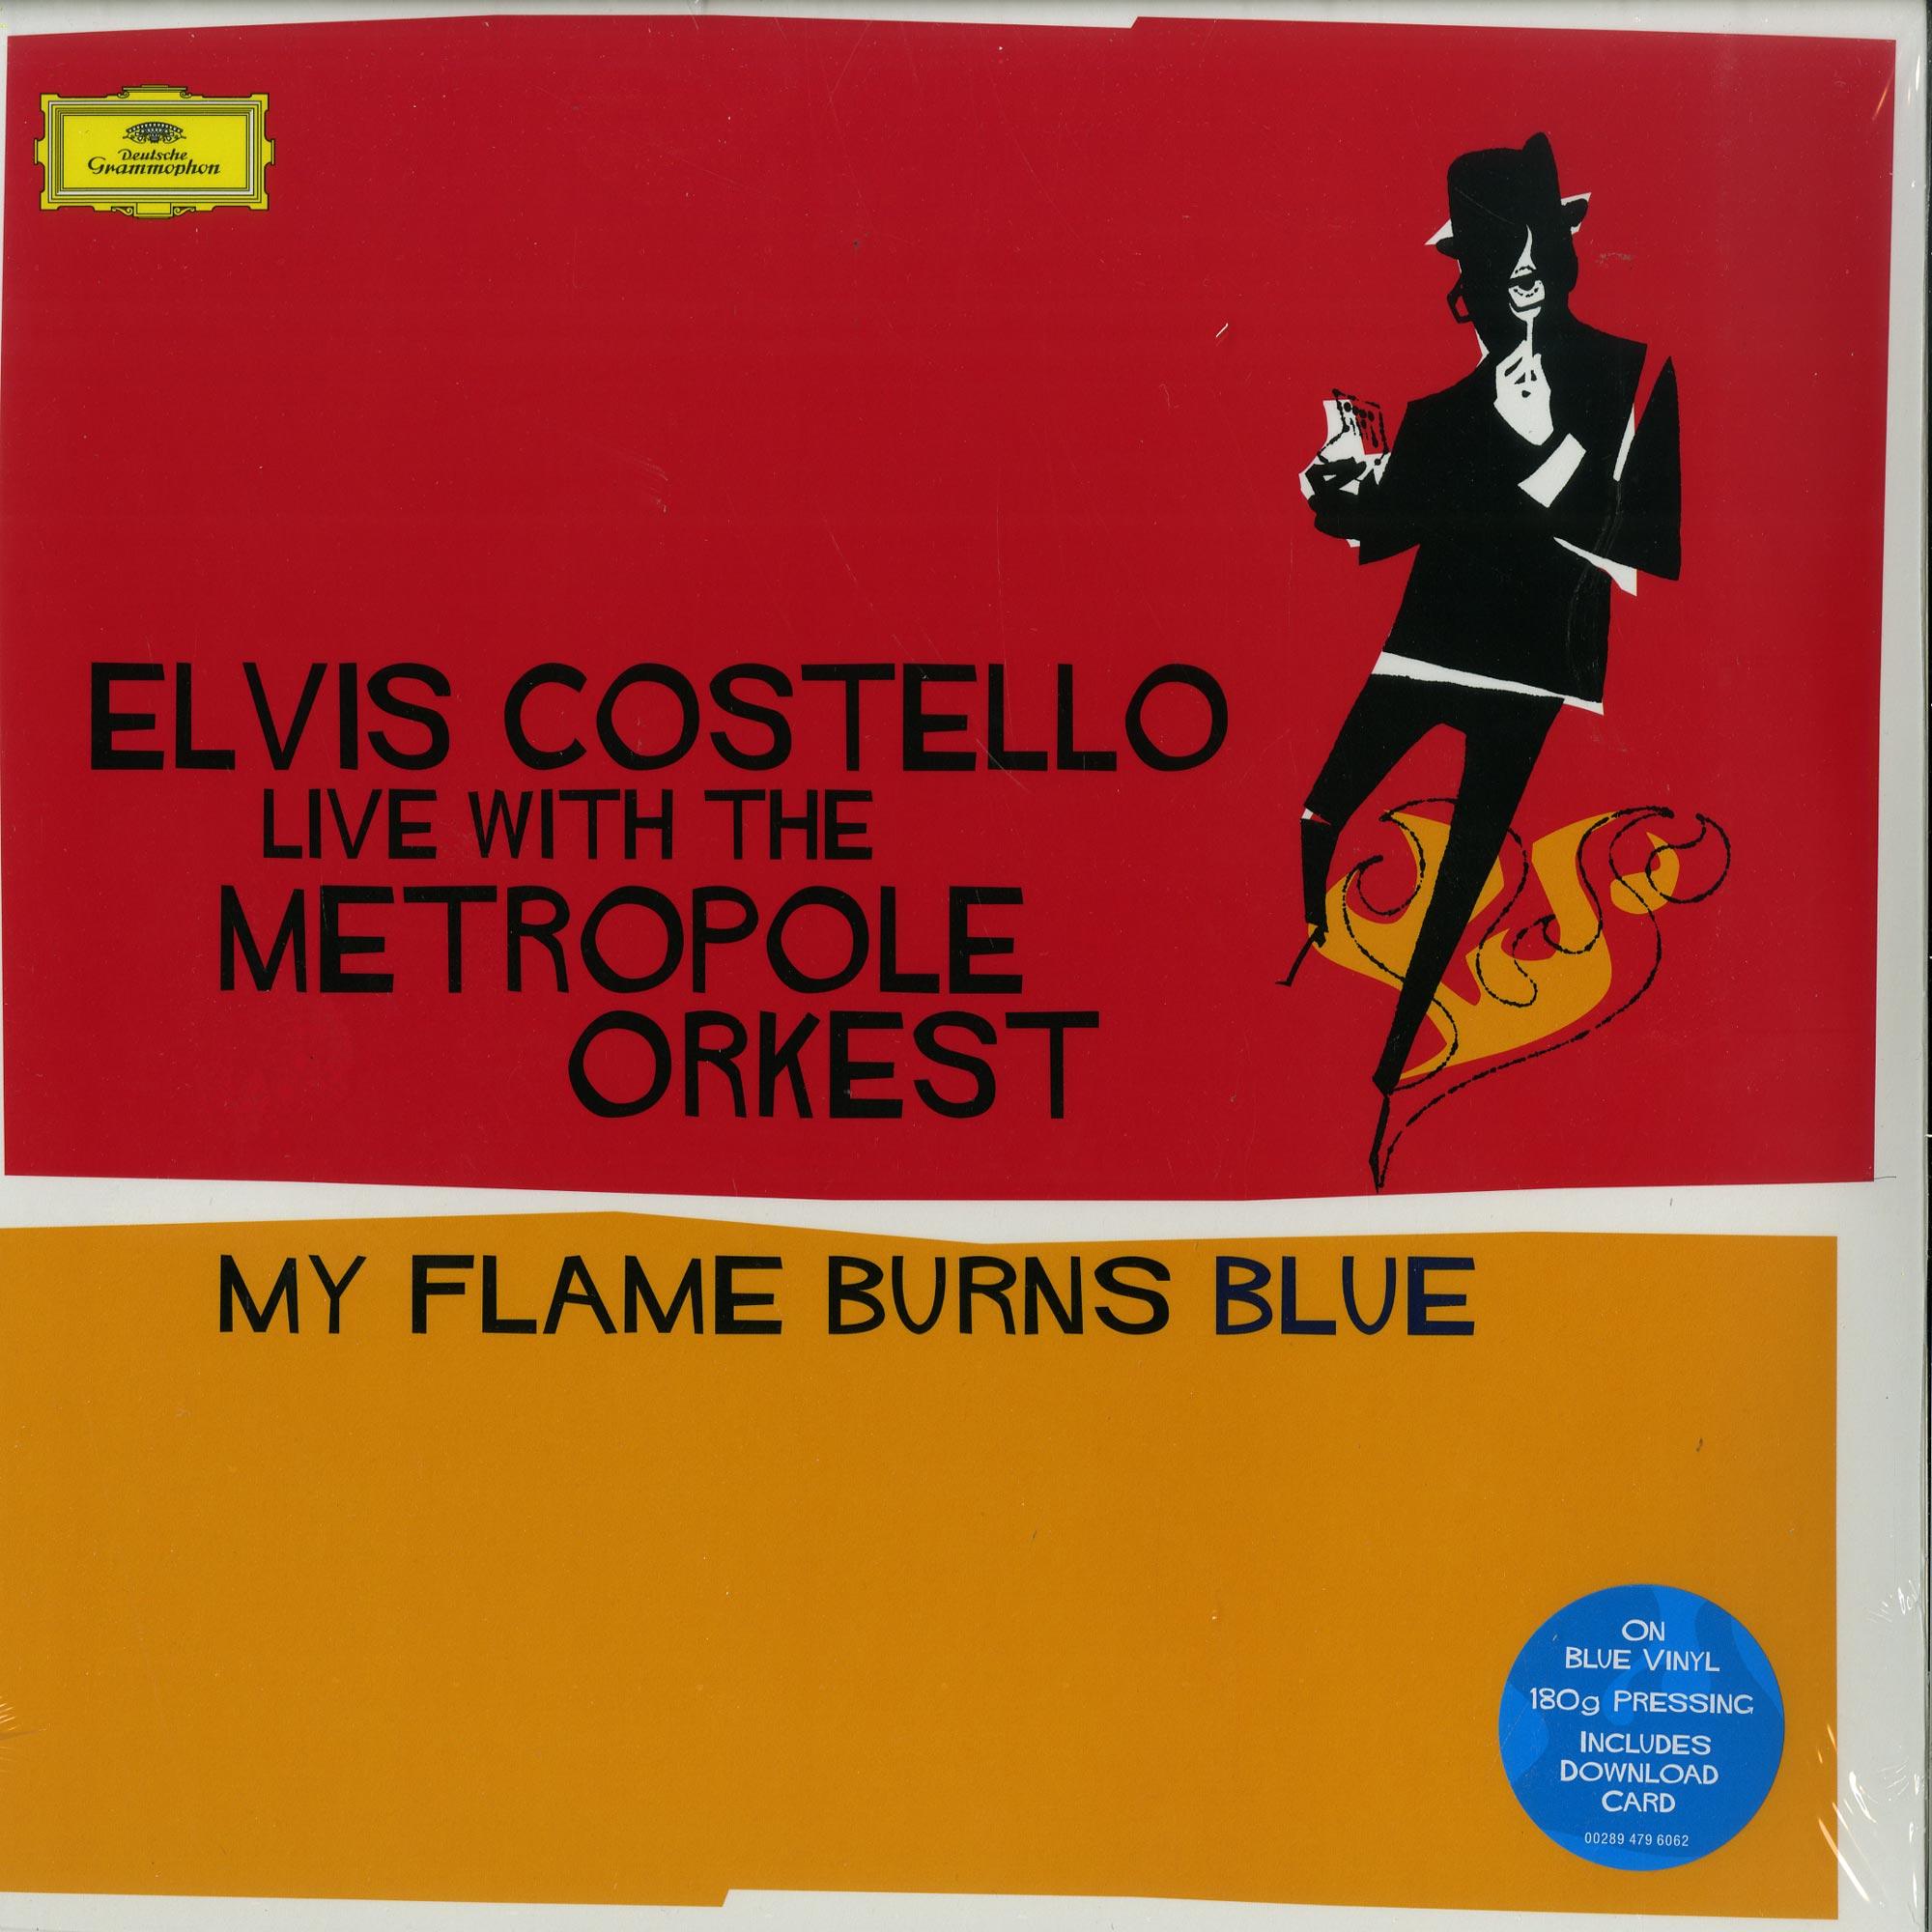 Elvis Costello - MY FLAME BURNS BLUE